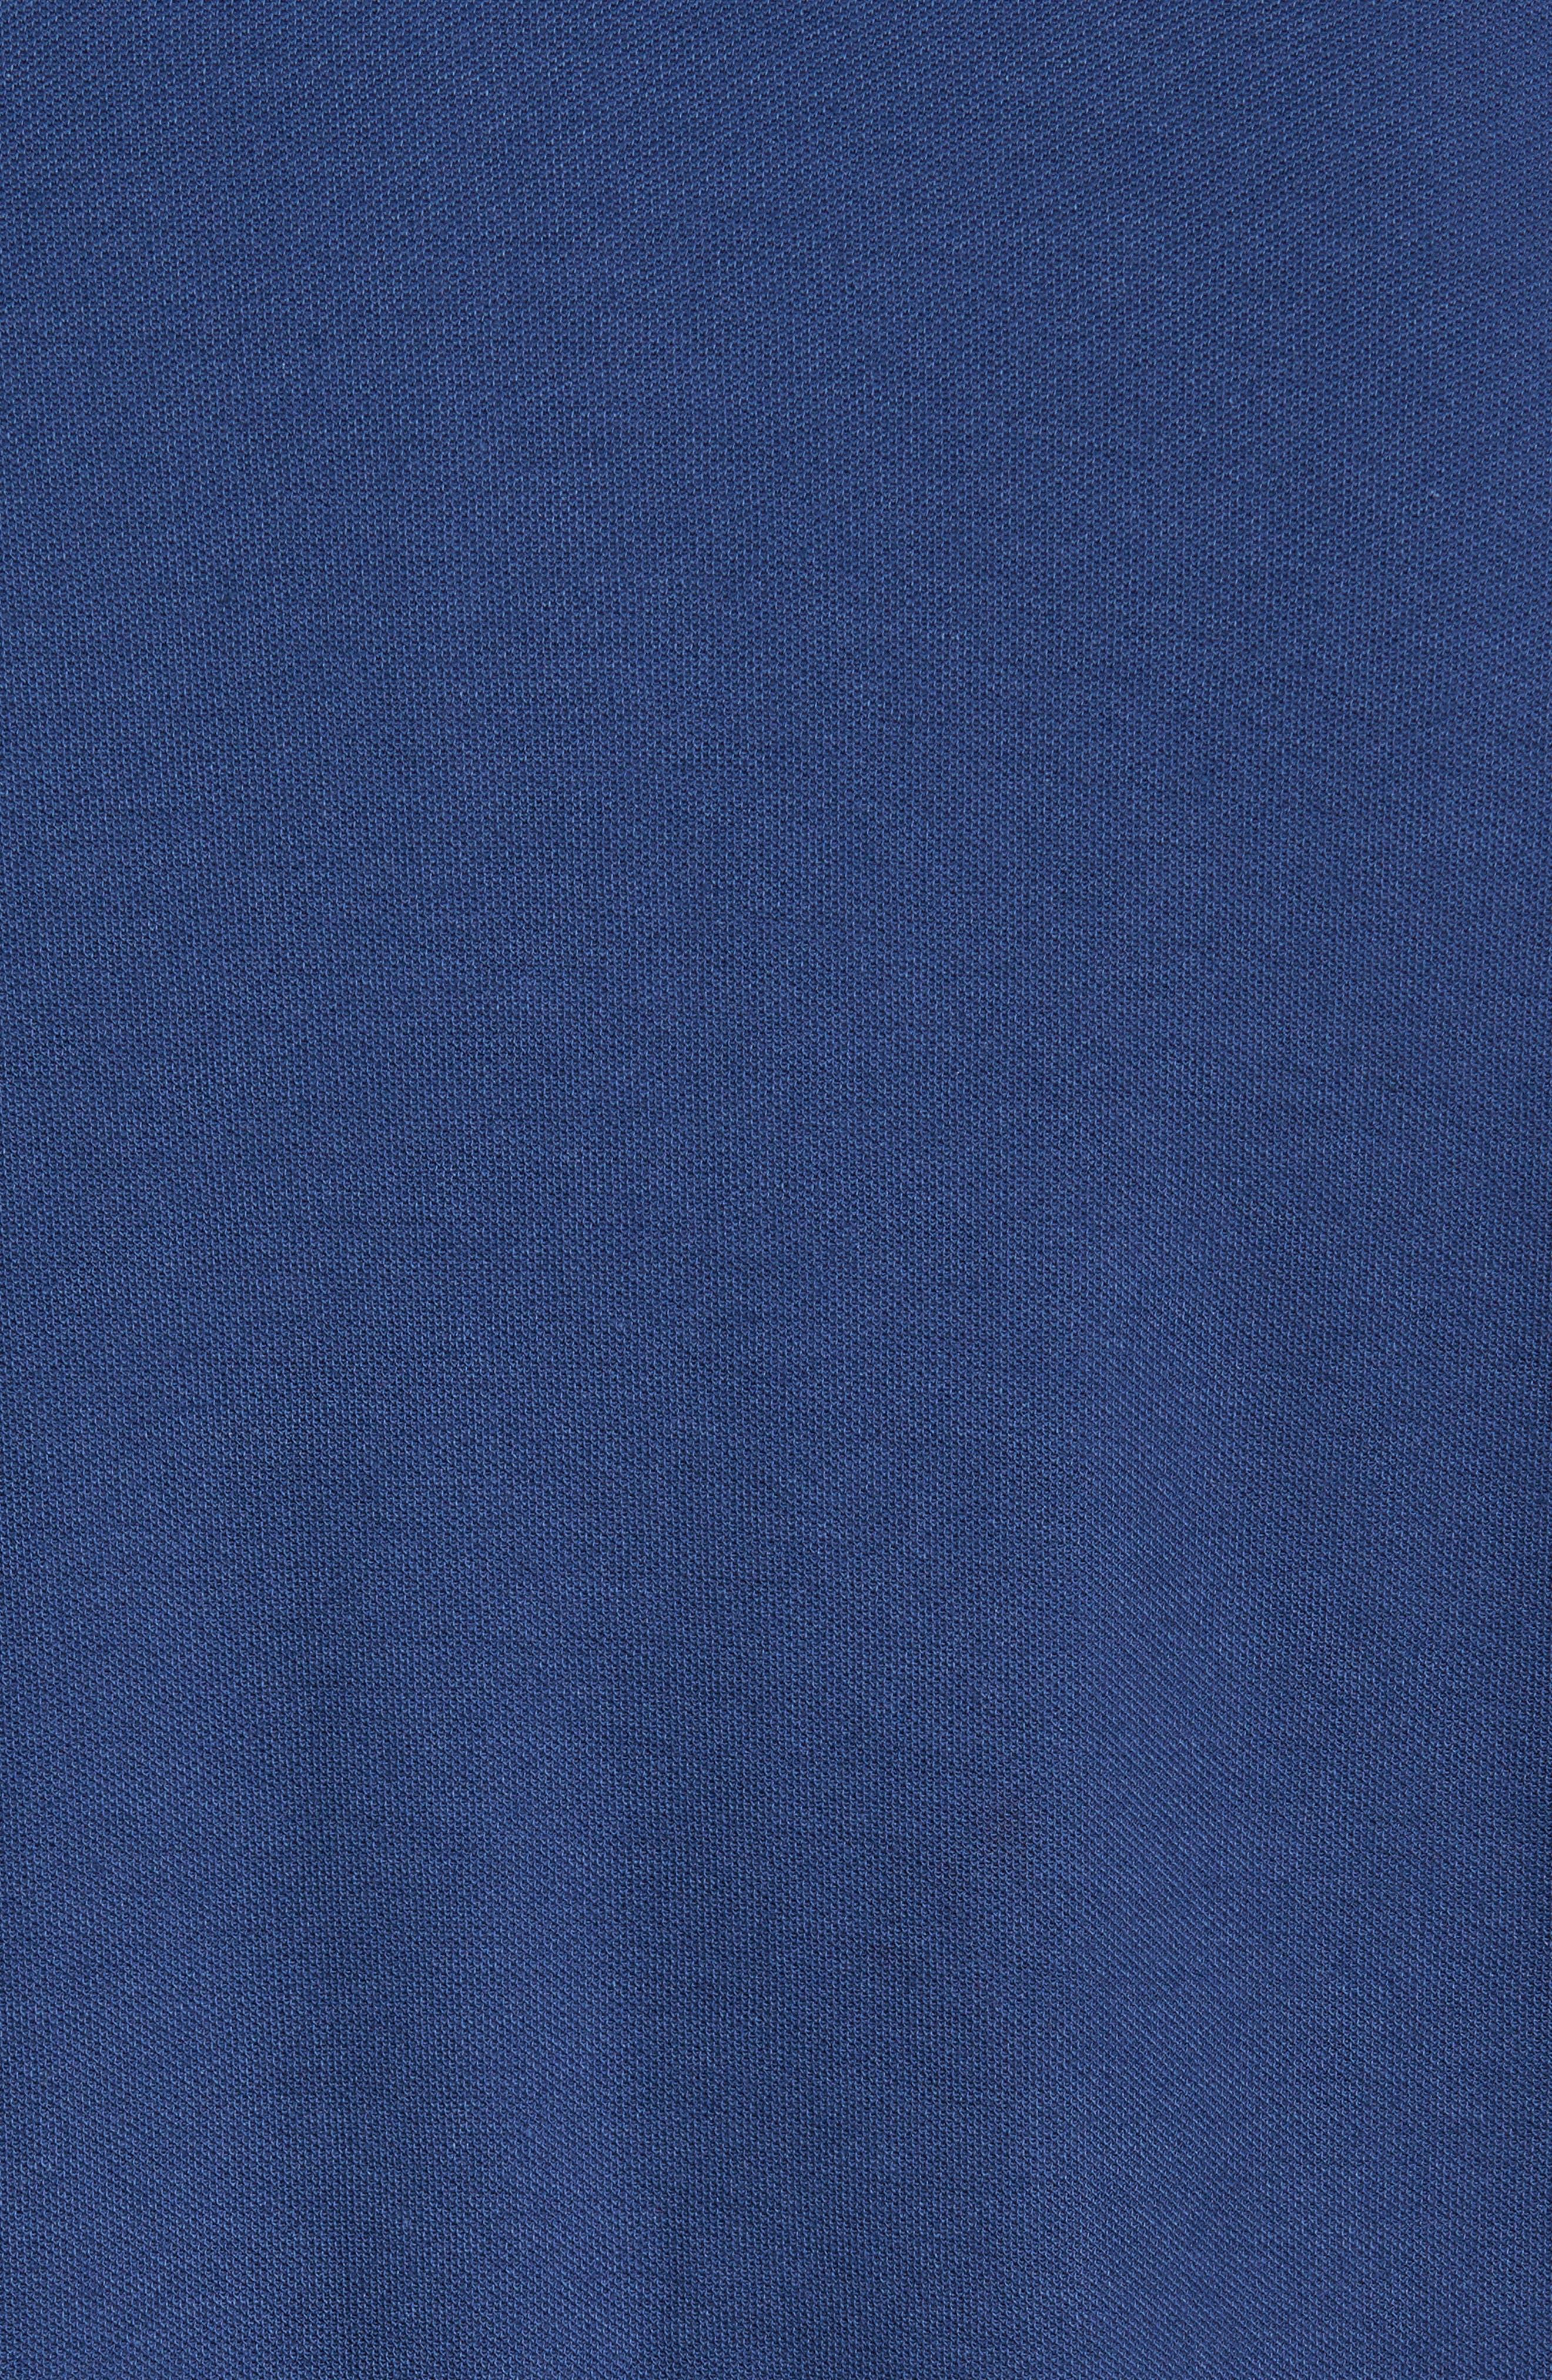 Tropicool Spectator Piqué Polo,                             Alternate thumbnail 5, color,                             Bering Blue